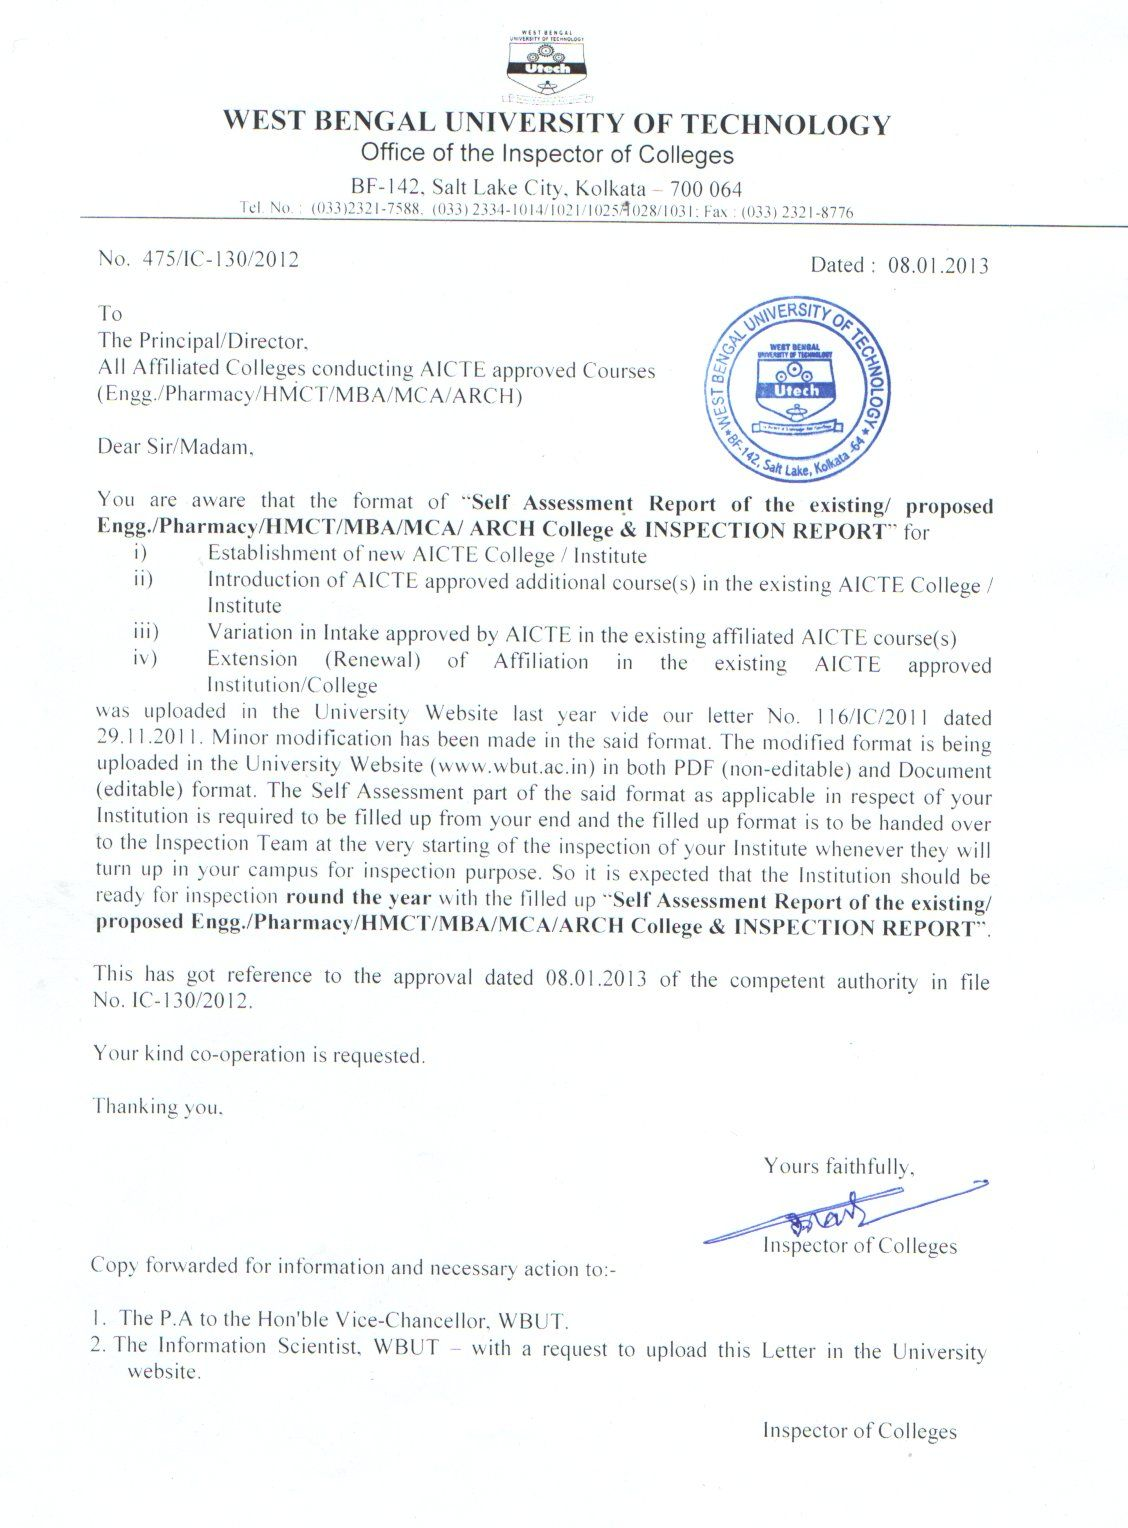 aicte colleges for new renewal affiliation pdf format doc job ...